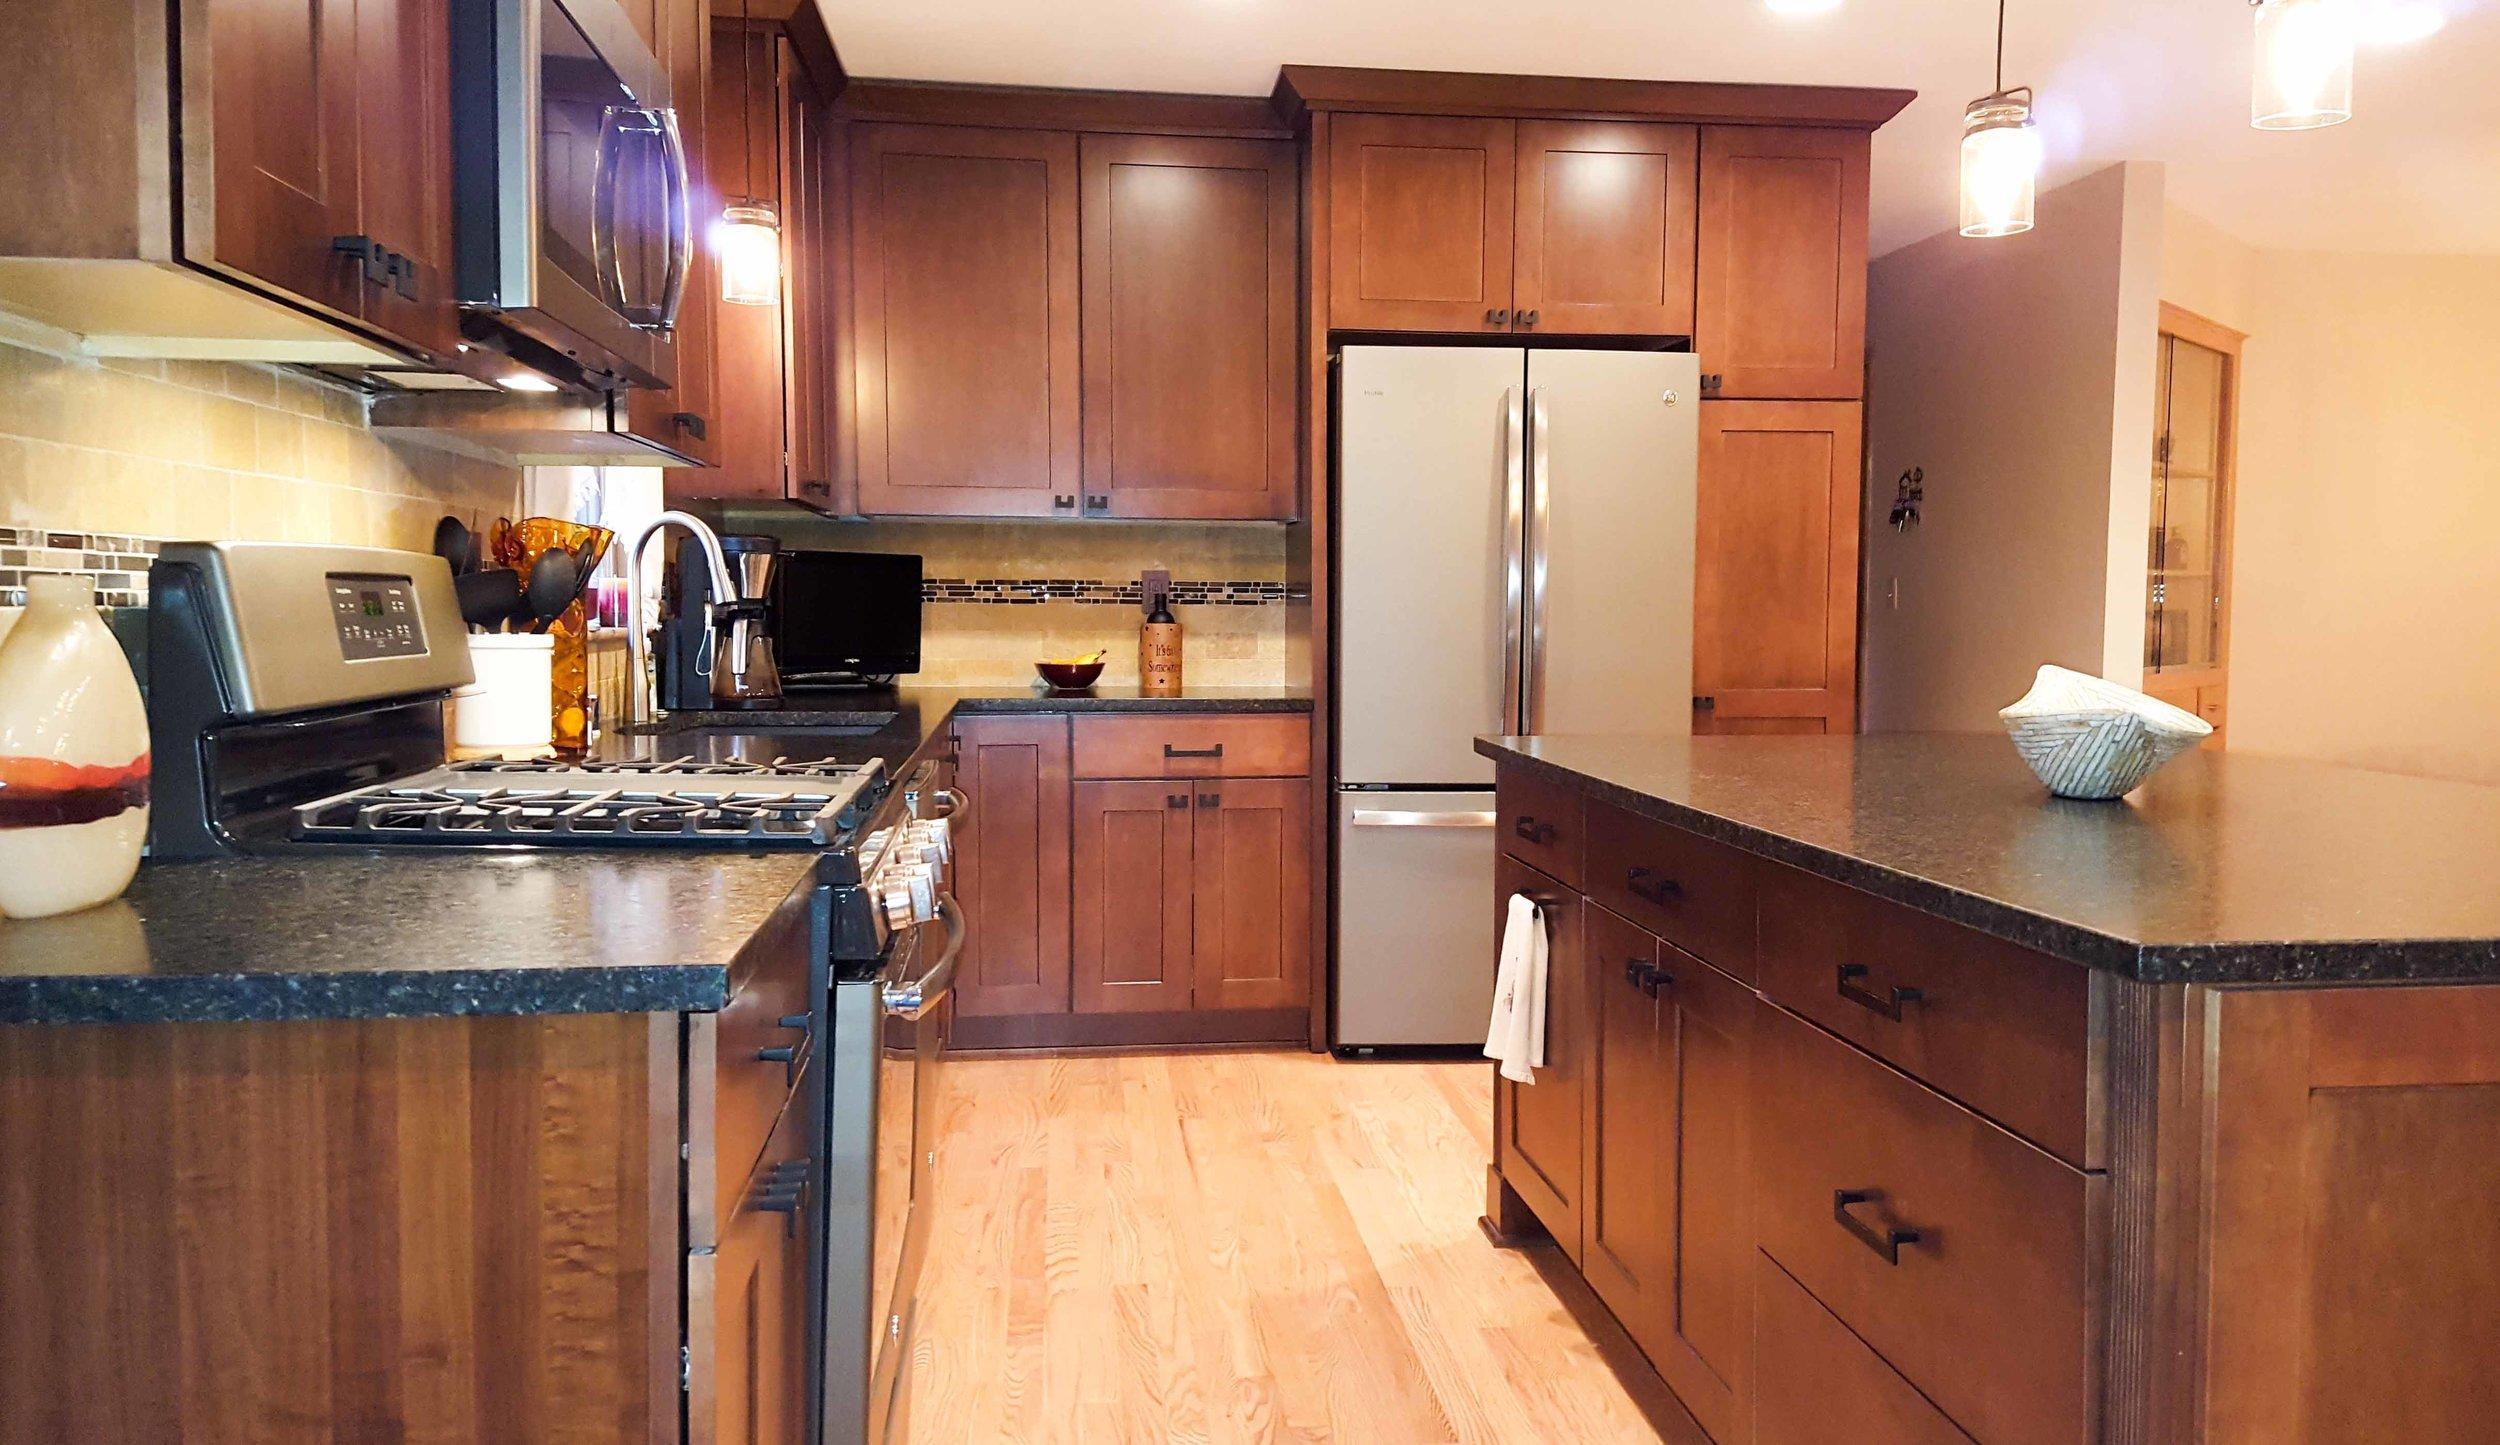 kitchen woodfloor_web.jpg